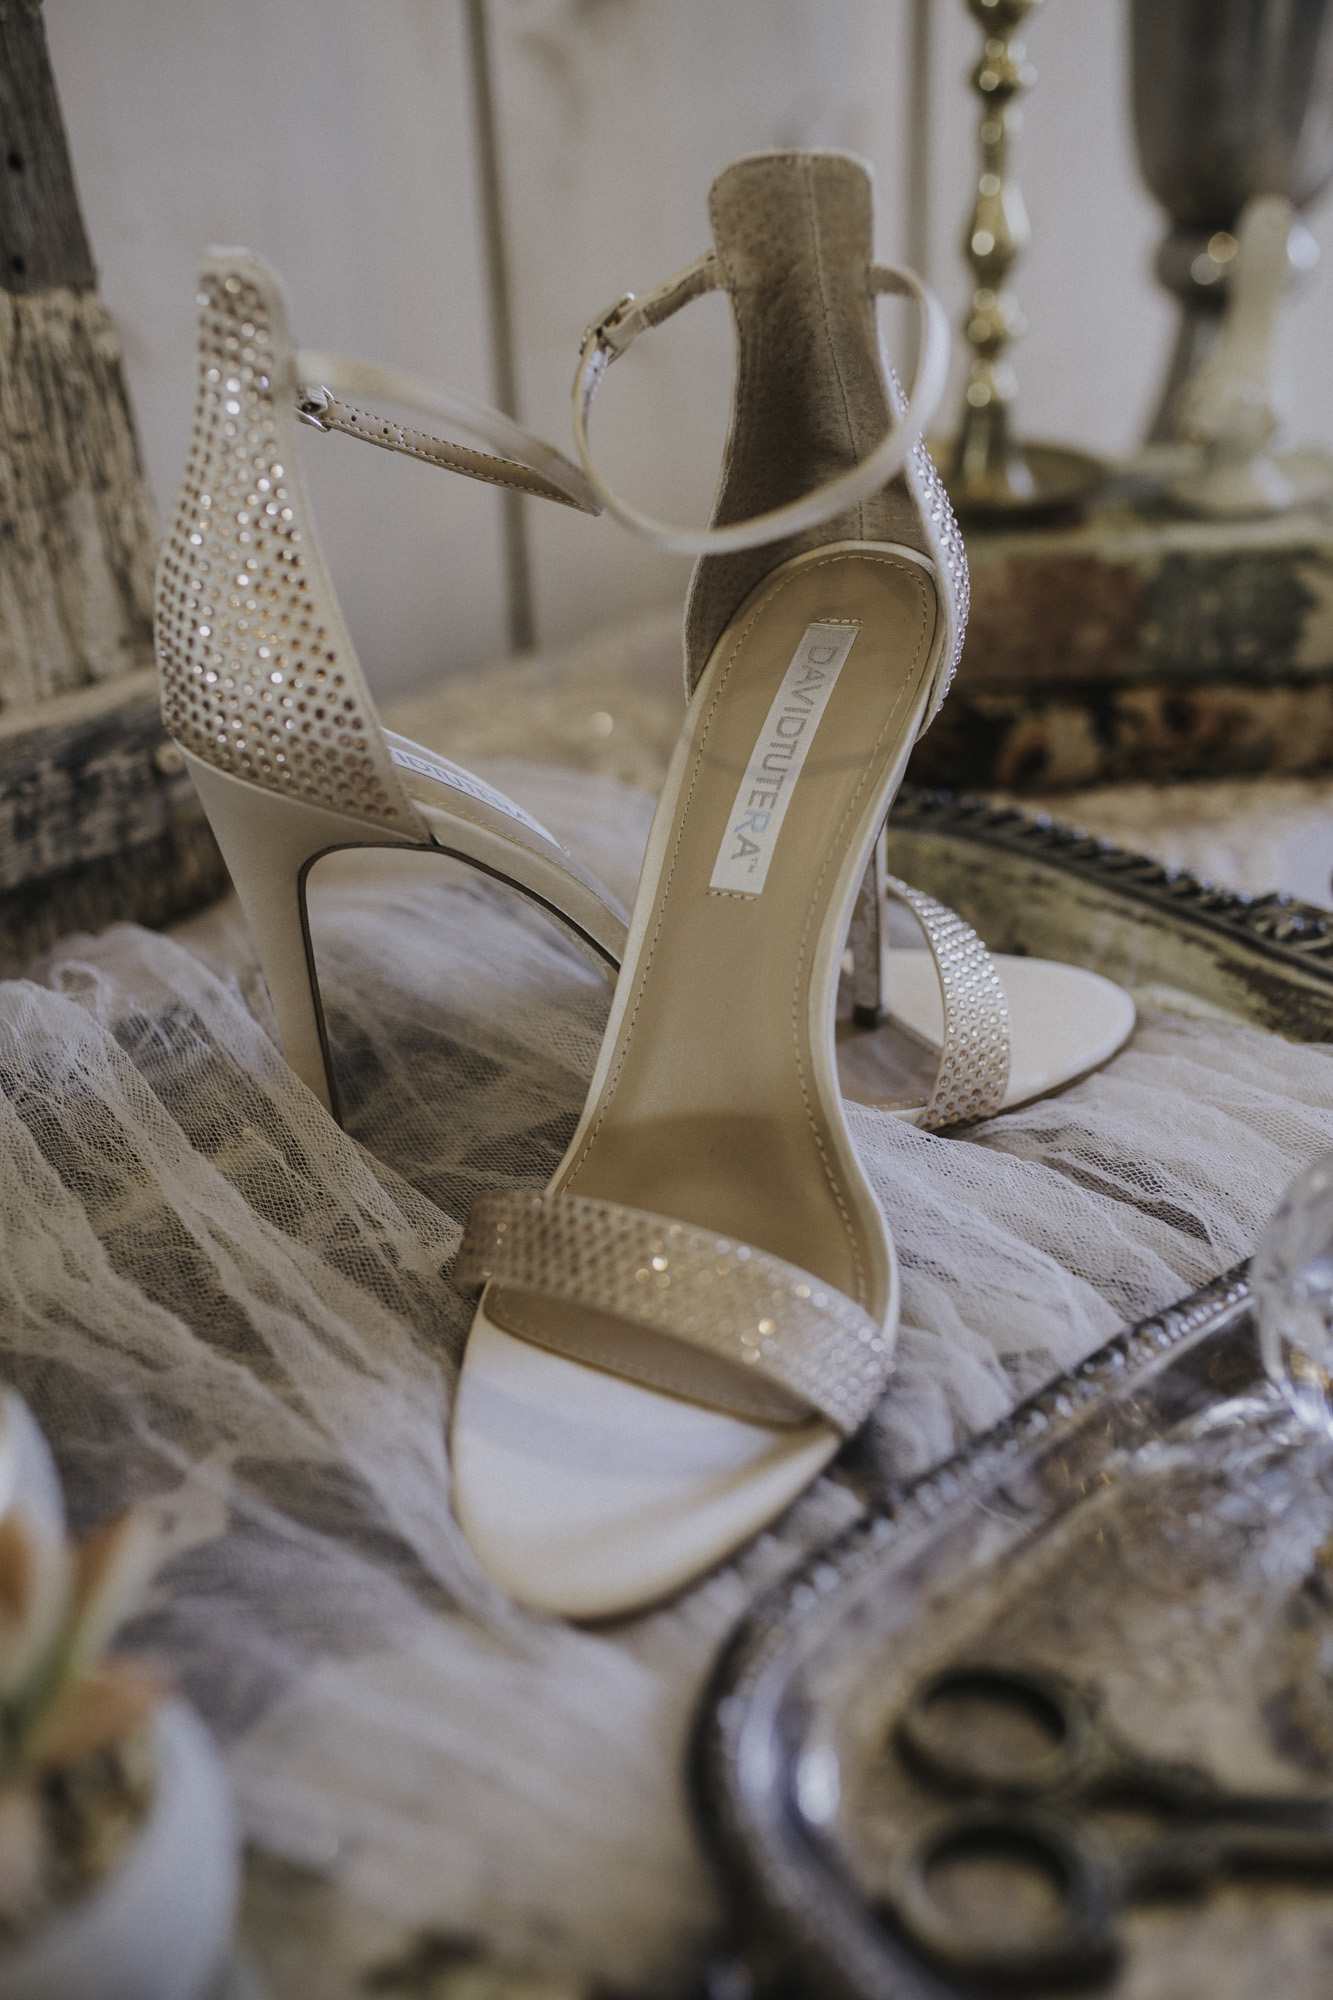 Cate_Ann_Photography_Dayton_Ohio_Wedding_Elopement_And_Engagement_PhotographerIMG_7843.jpg